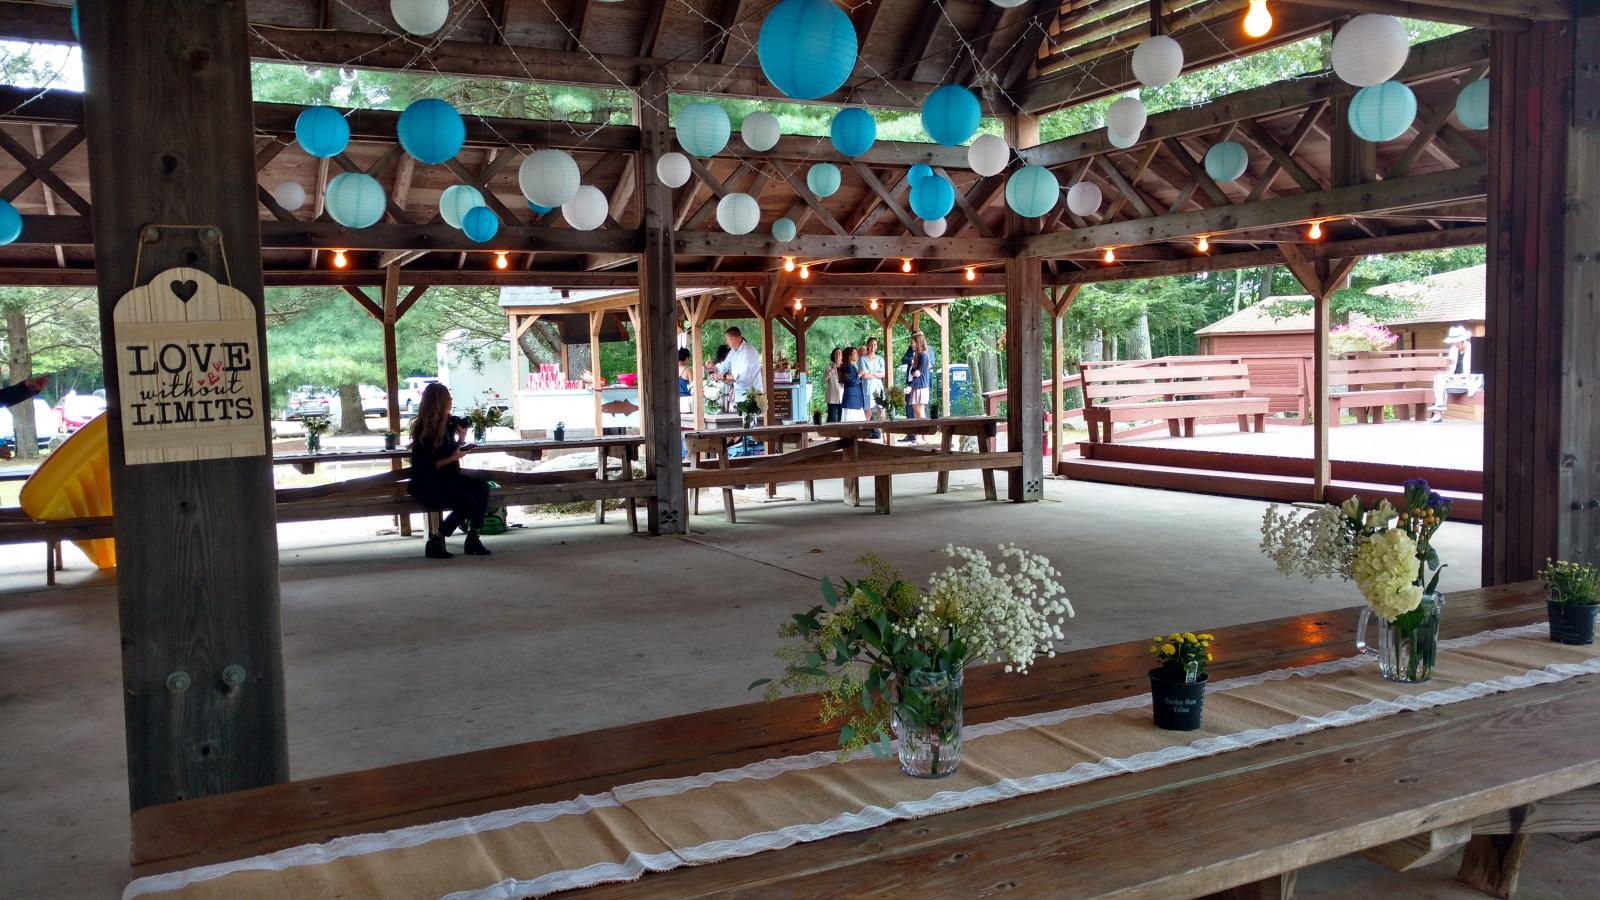 Pavilion decorated for wedding September 2018